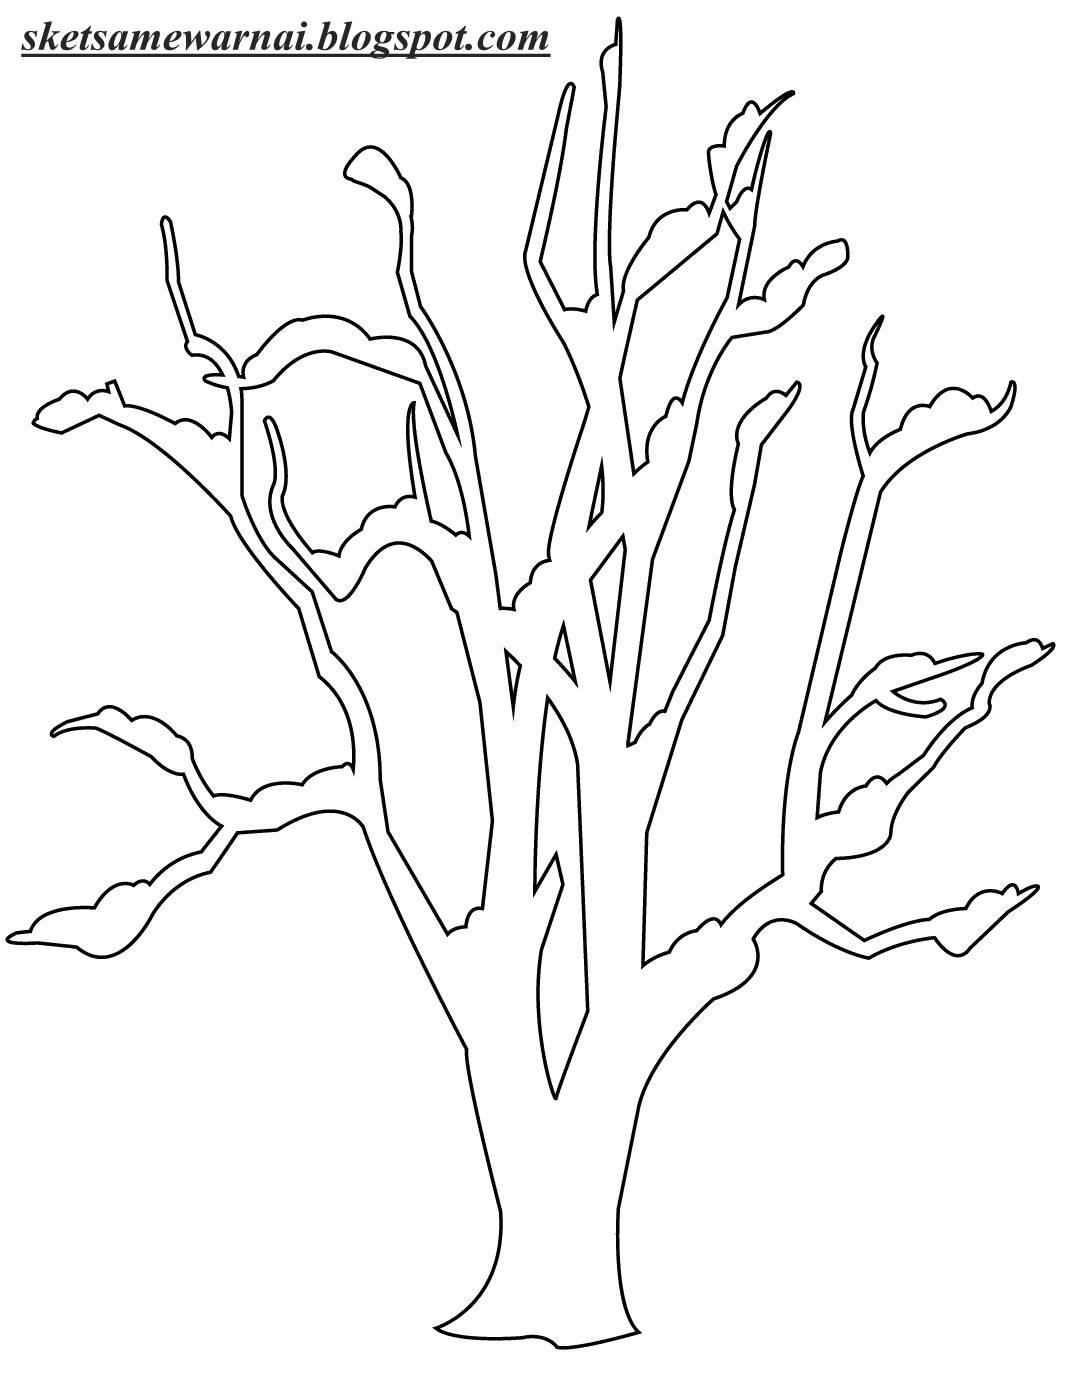 Kumpulan Gambar Mewarnai Pohon